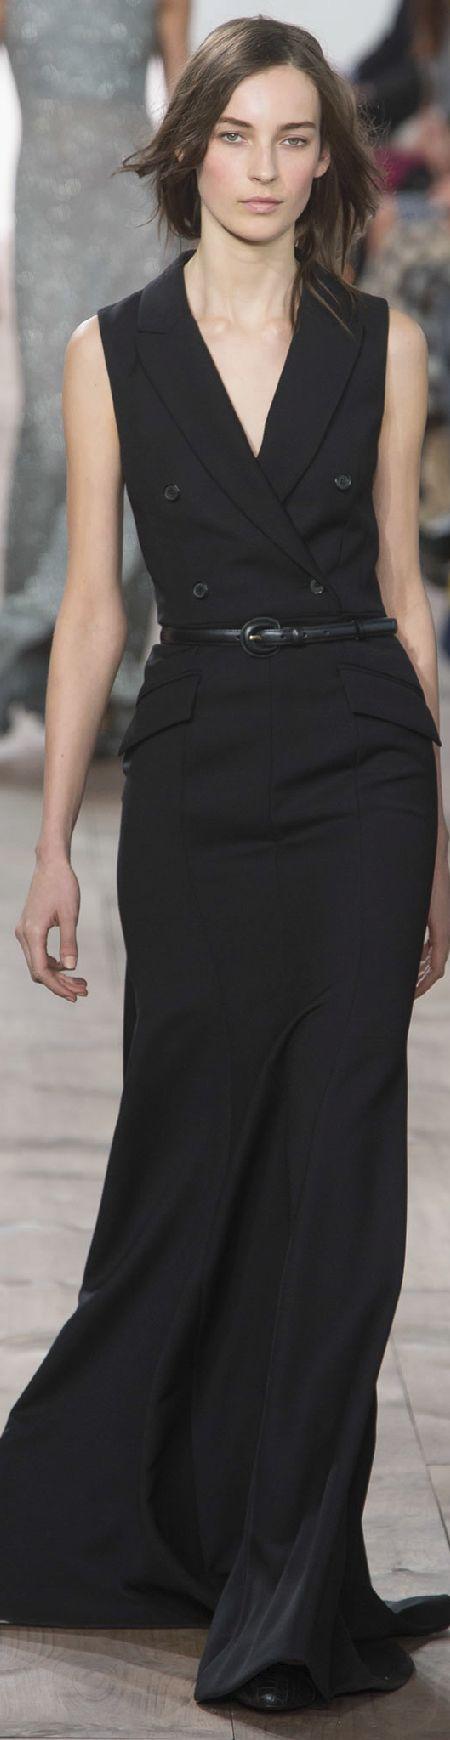 Fall 2015 Ready-to-Wear Michael Kors